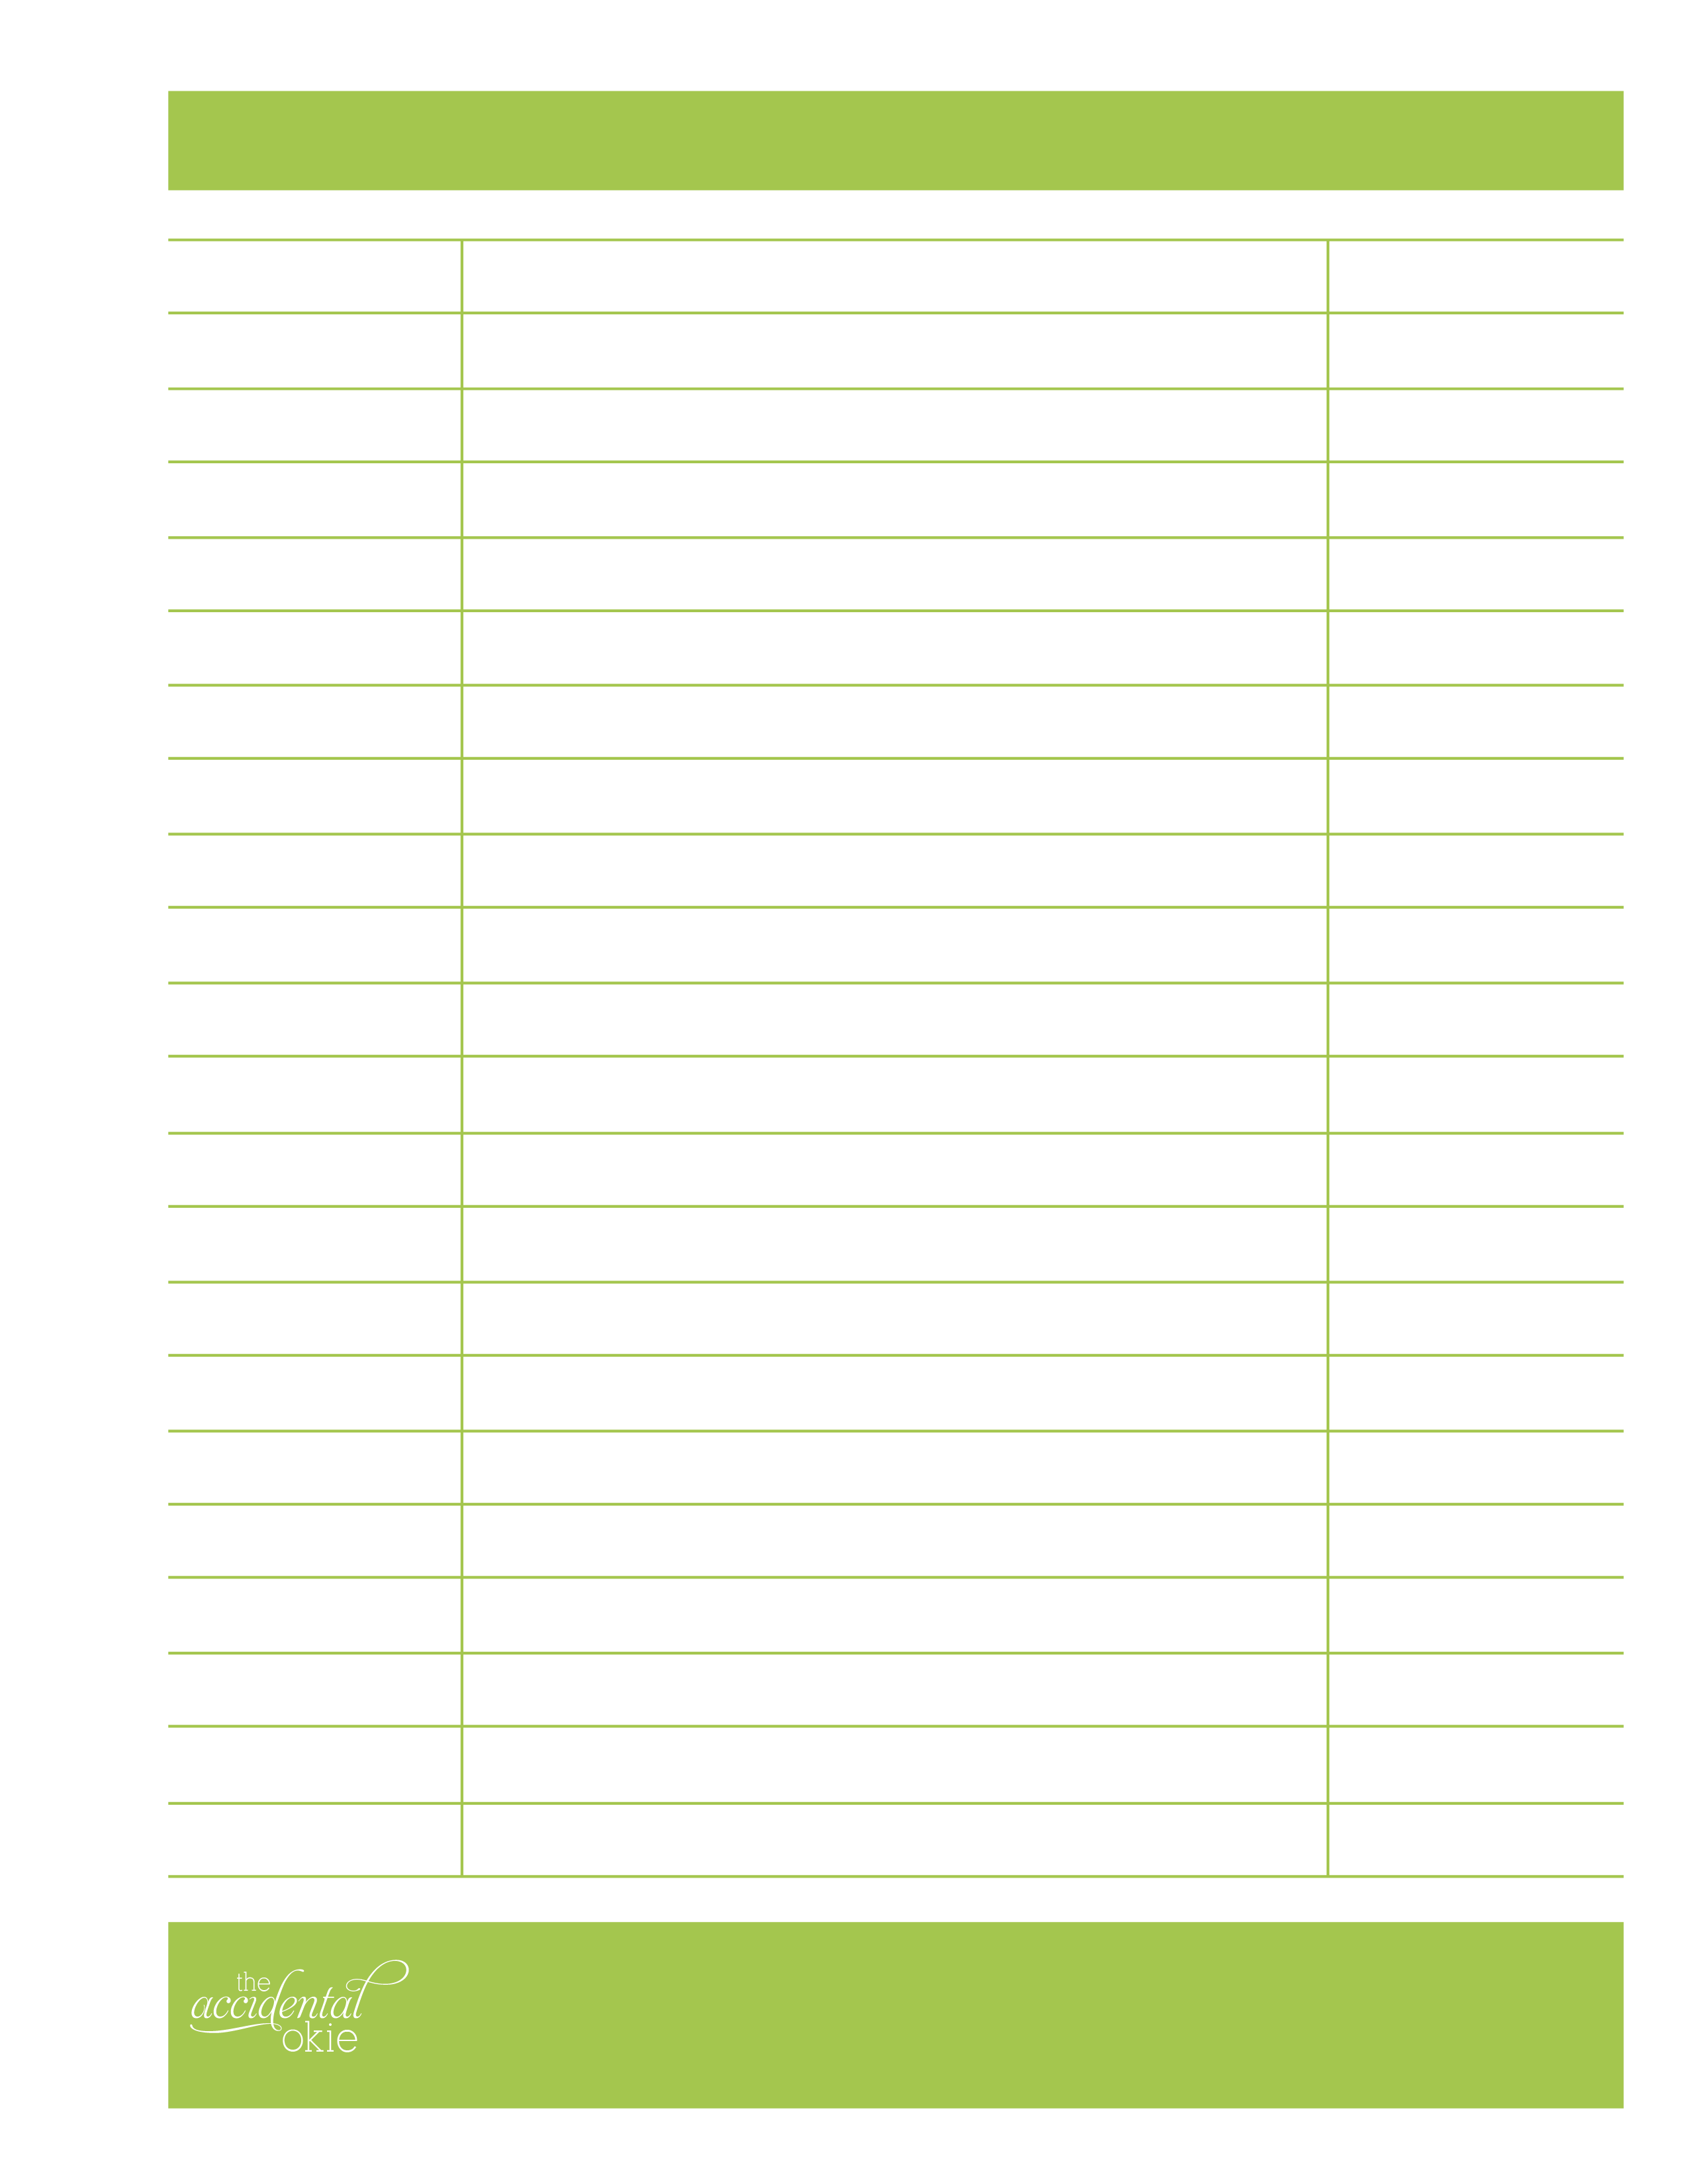 Pin By Sabrina Breuker On Organization